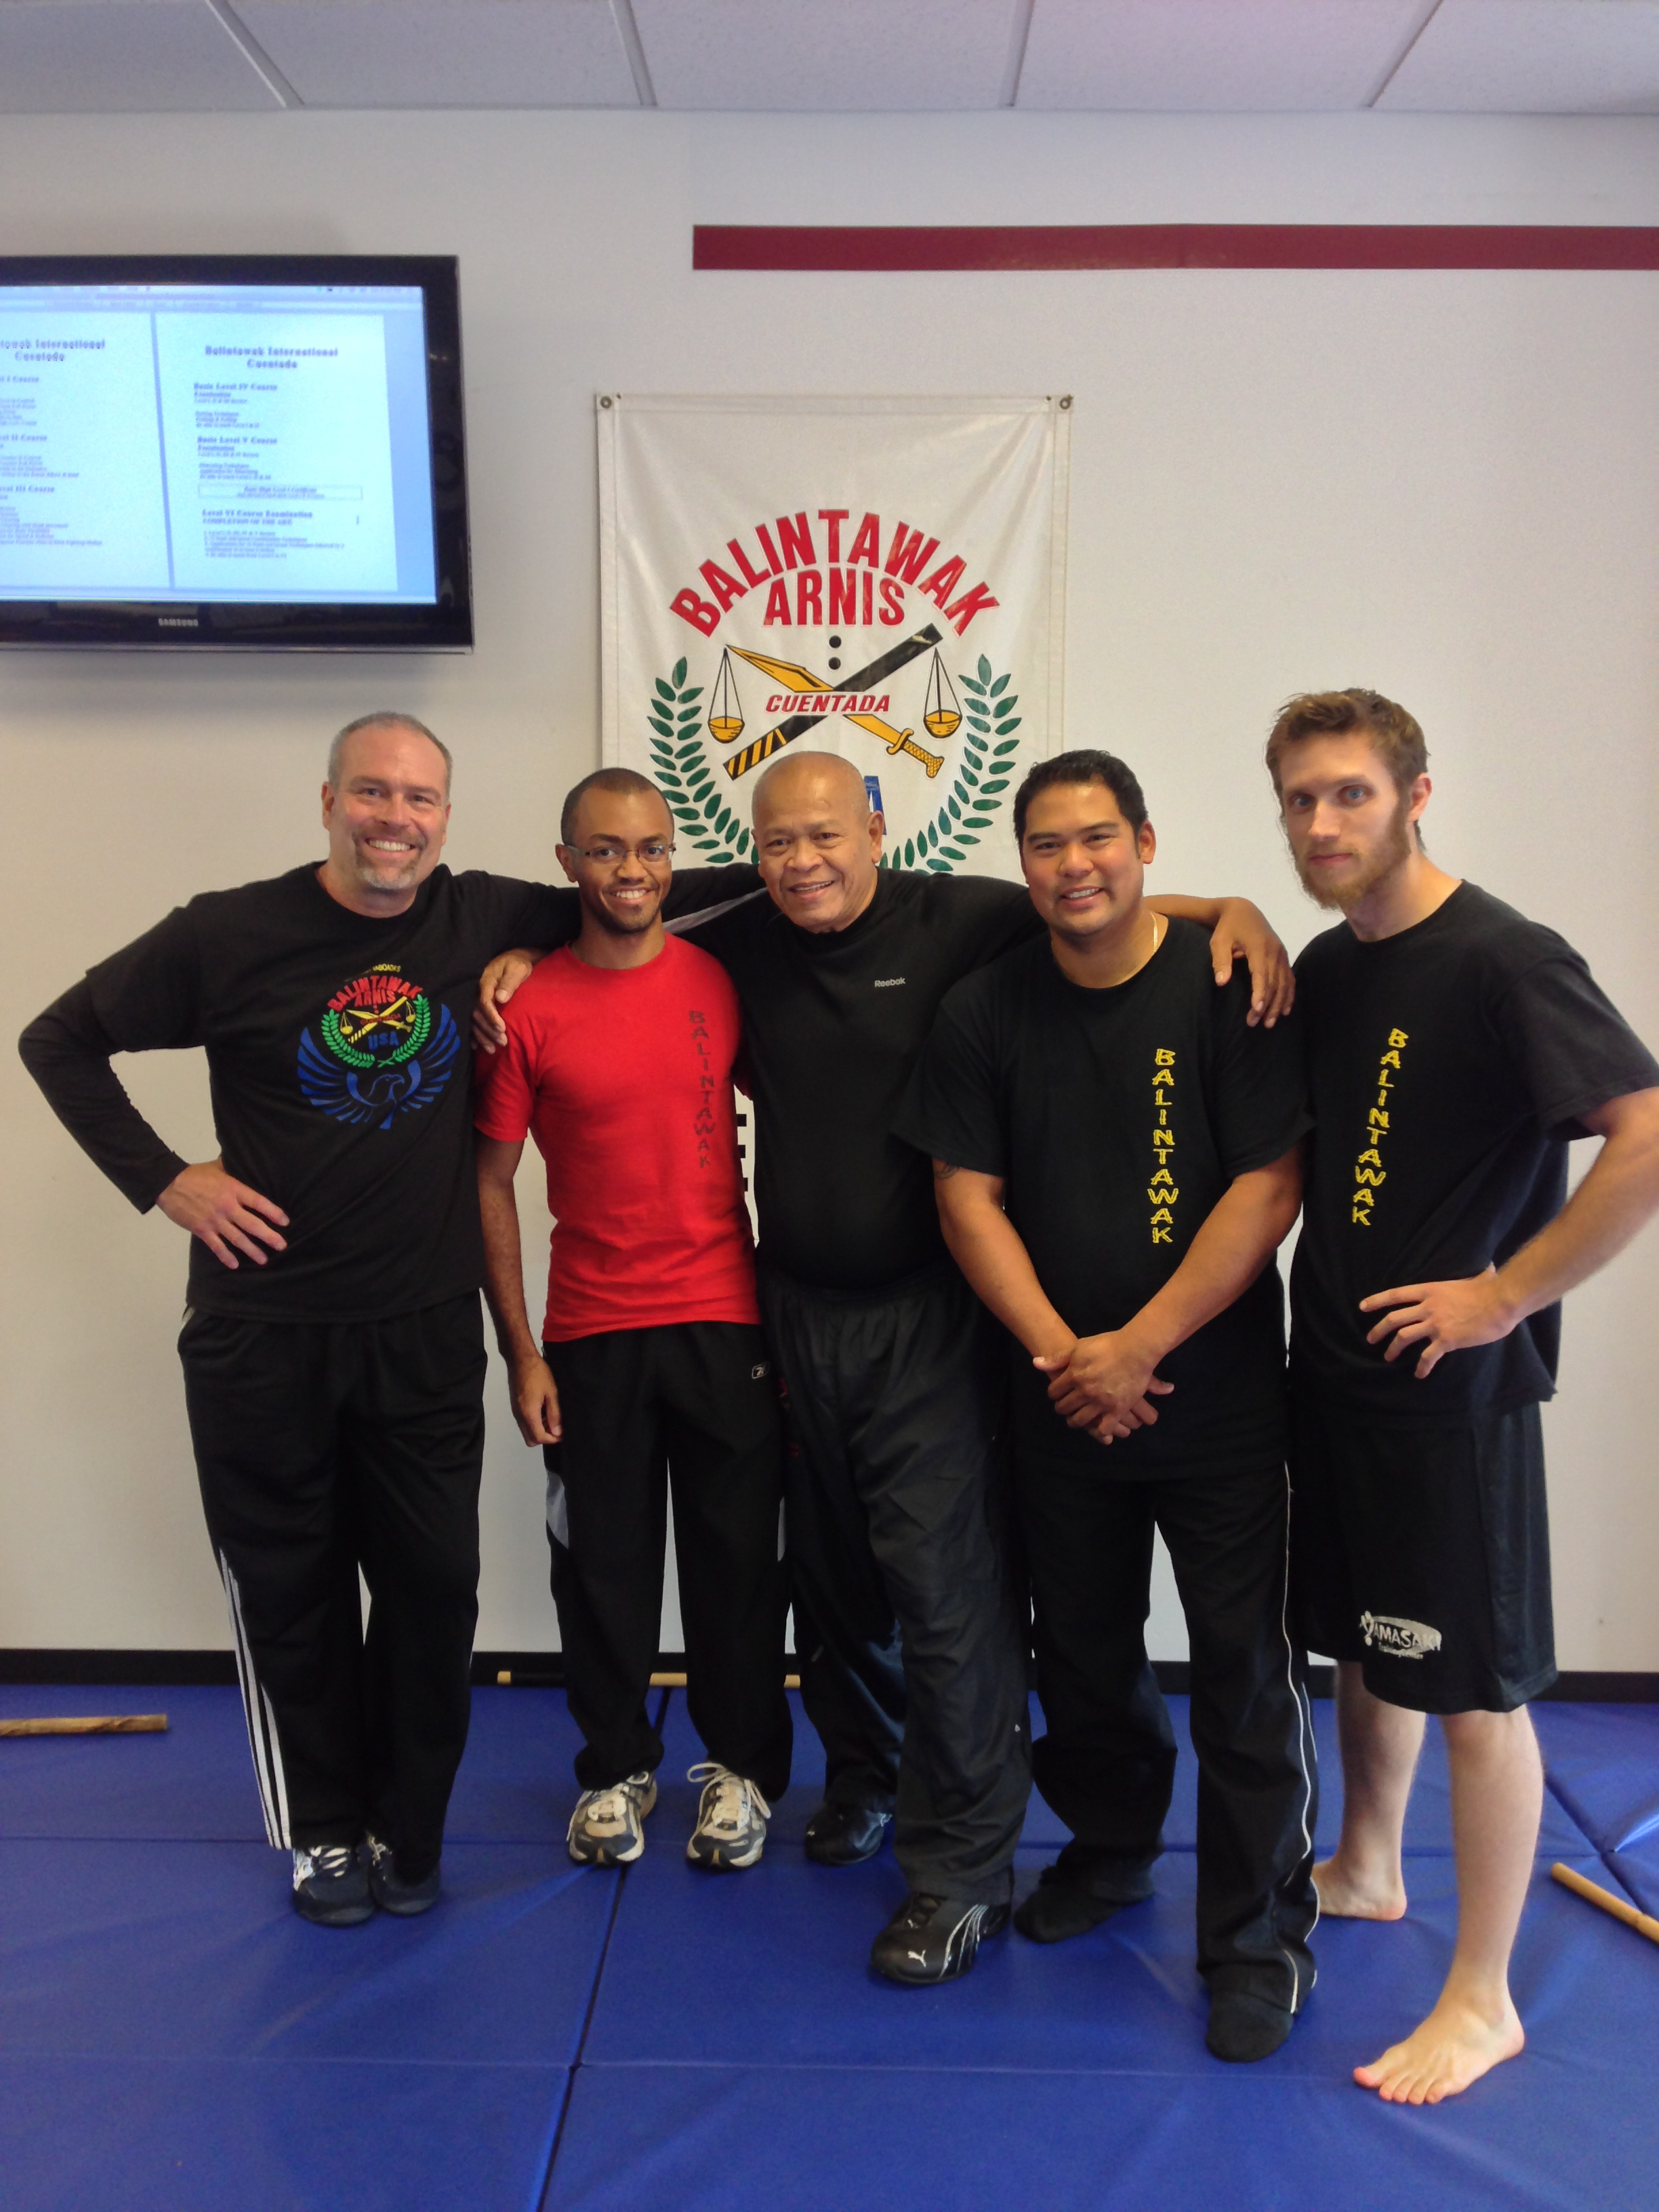 World Camp 2012 (L-R) Scott Meyer, Kinney Thompson, GM Bobby Taboada, Nebrido Nocon, Ben Winn